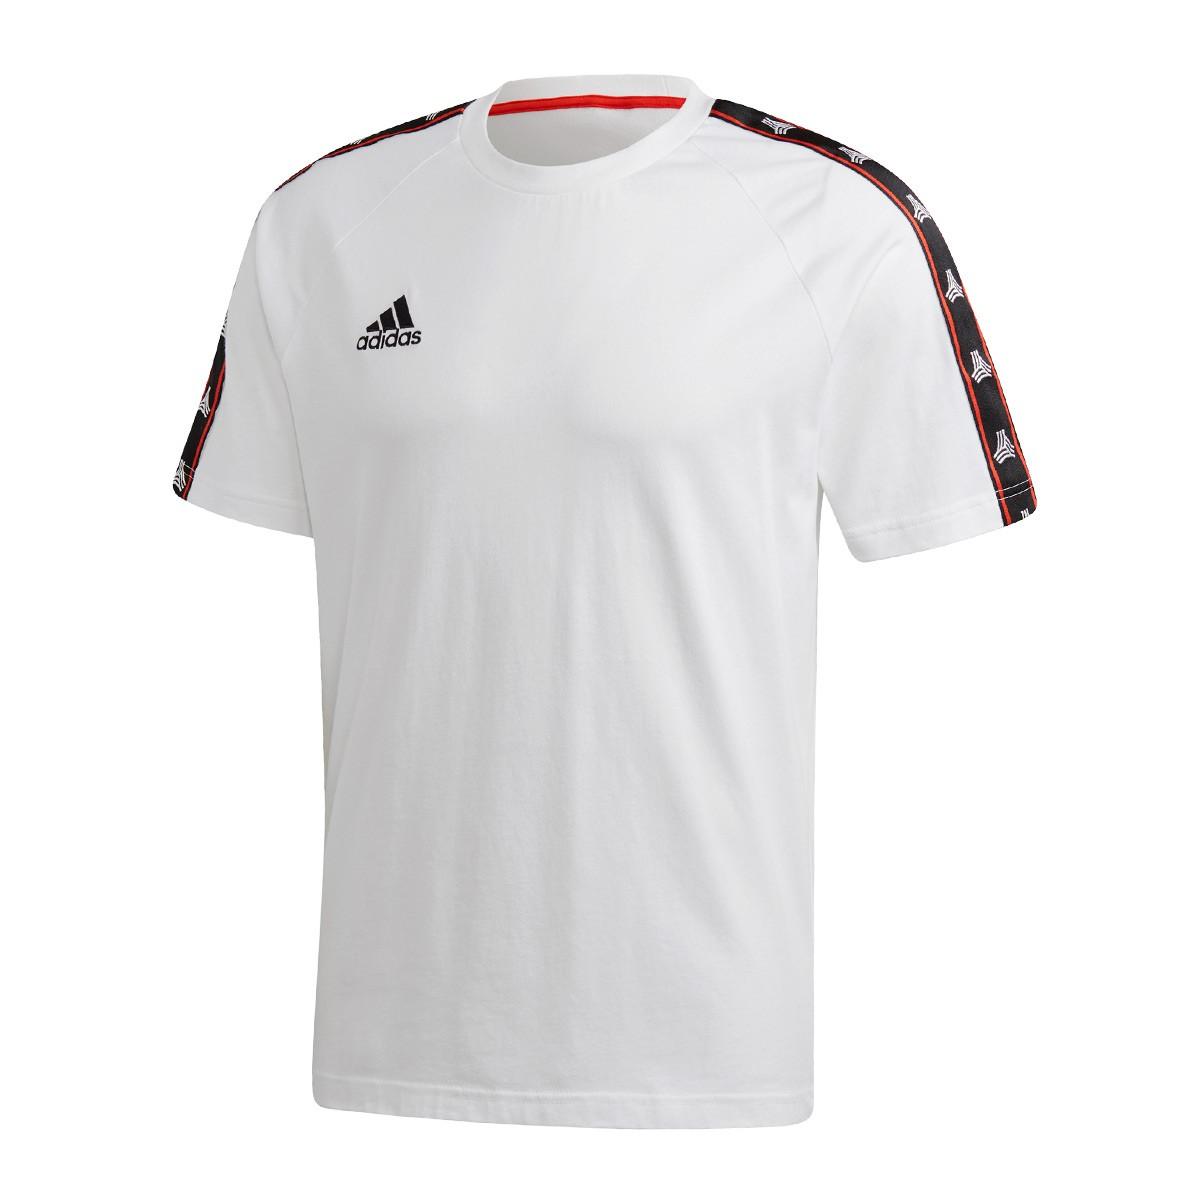 11183e16bb3f8e Jersey adidas Tango Tape White - Football store Fútbol Emotion